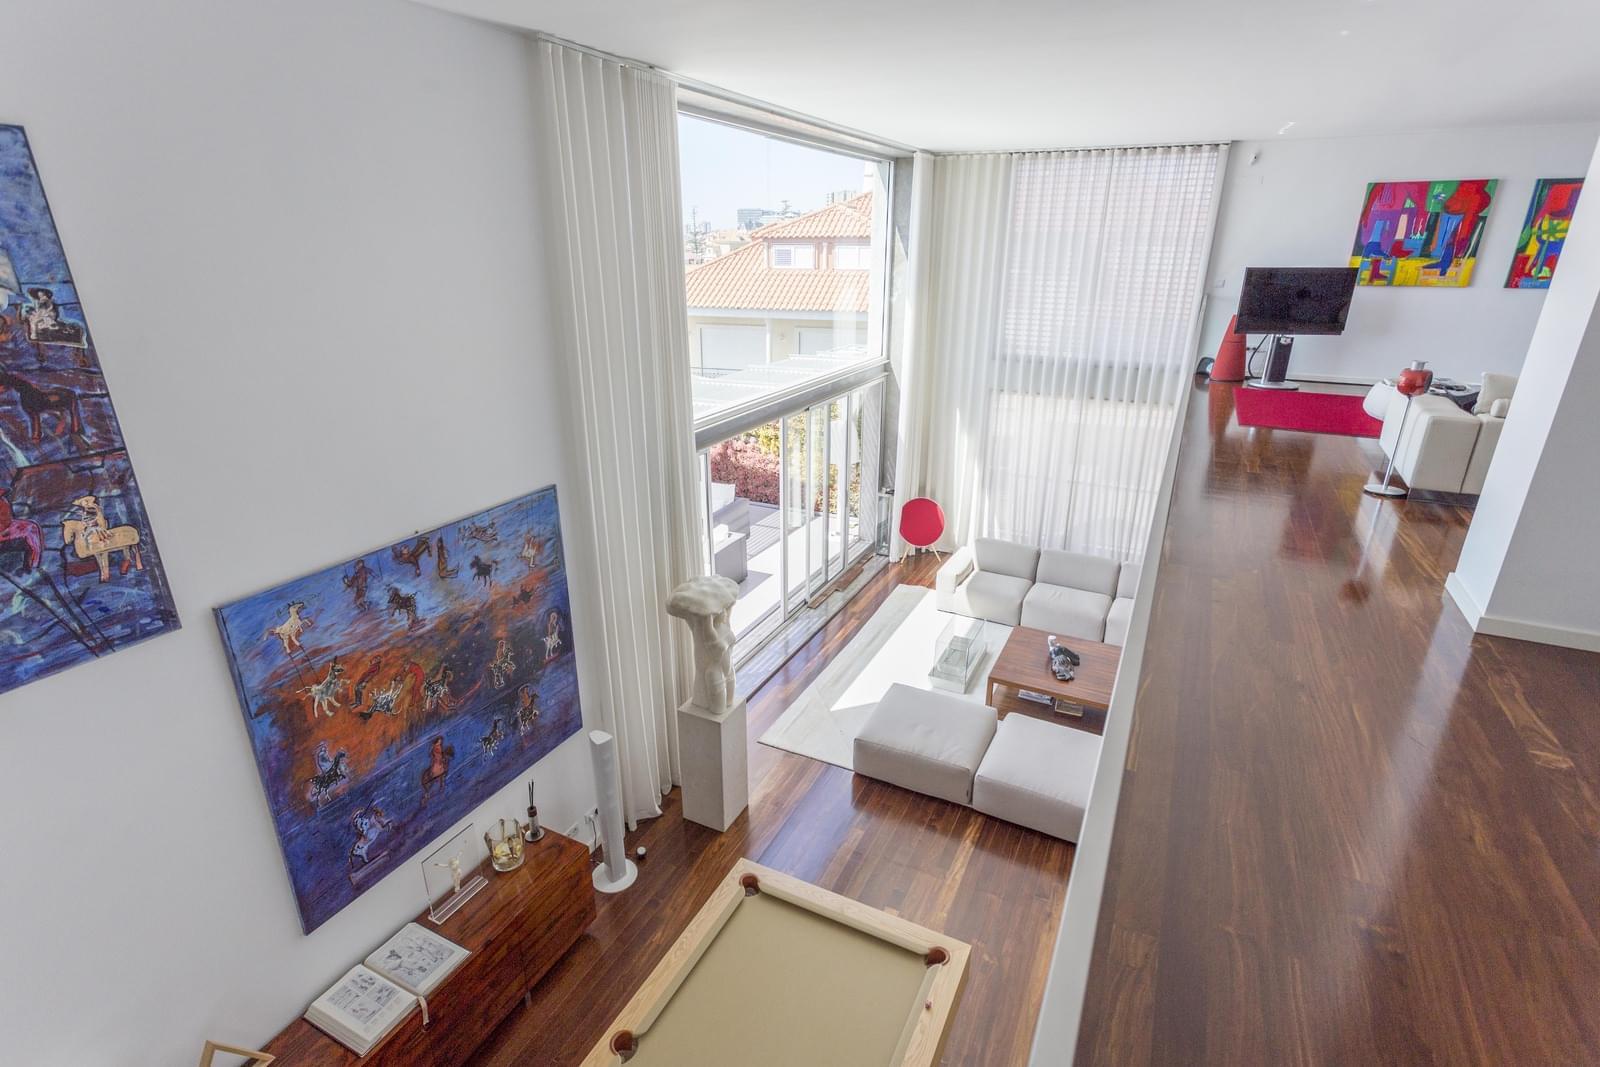 pf17631-apartamento-t5-cascais-84d84851-aee6-478d-9784-37197cd73586